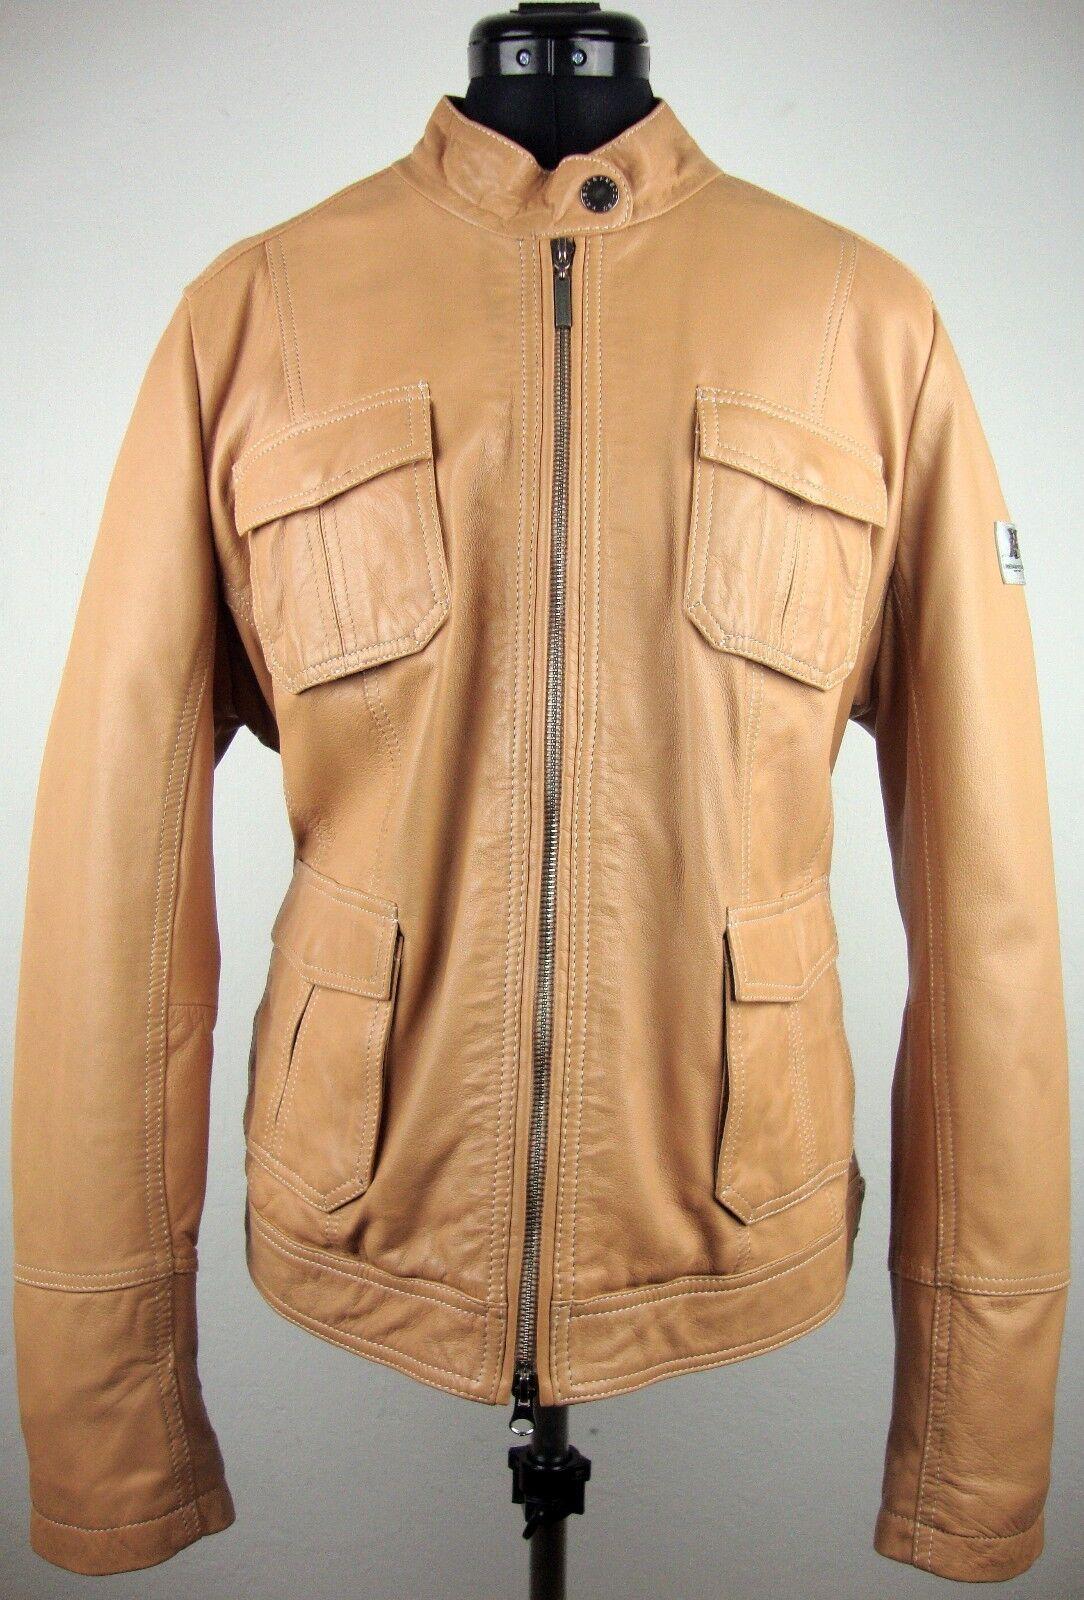 FRIEDA & FrotDIES NEW YORK Leather Jacket Damen Lederjacke Gr.46 NEU mit ETIKET